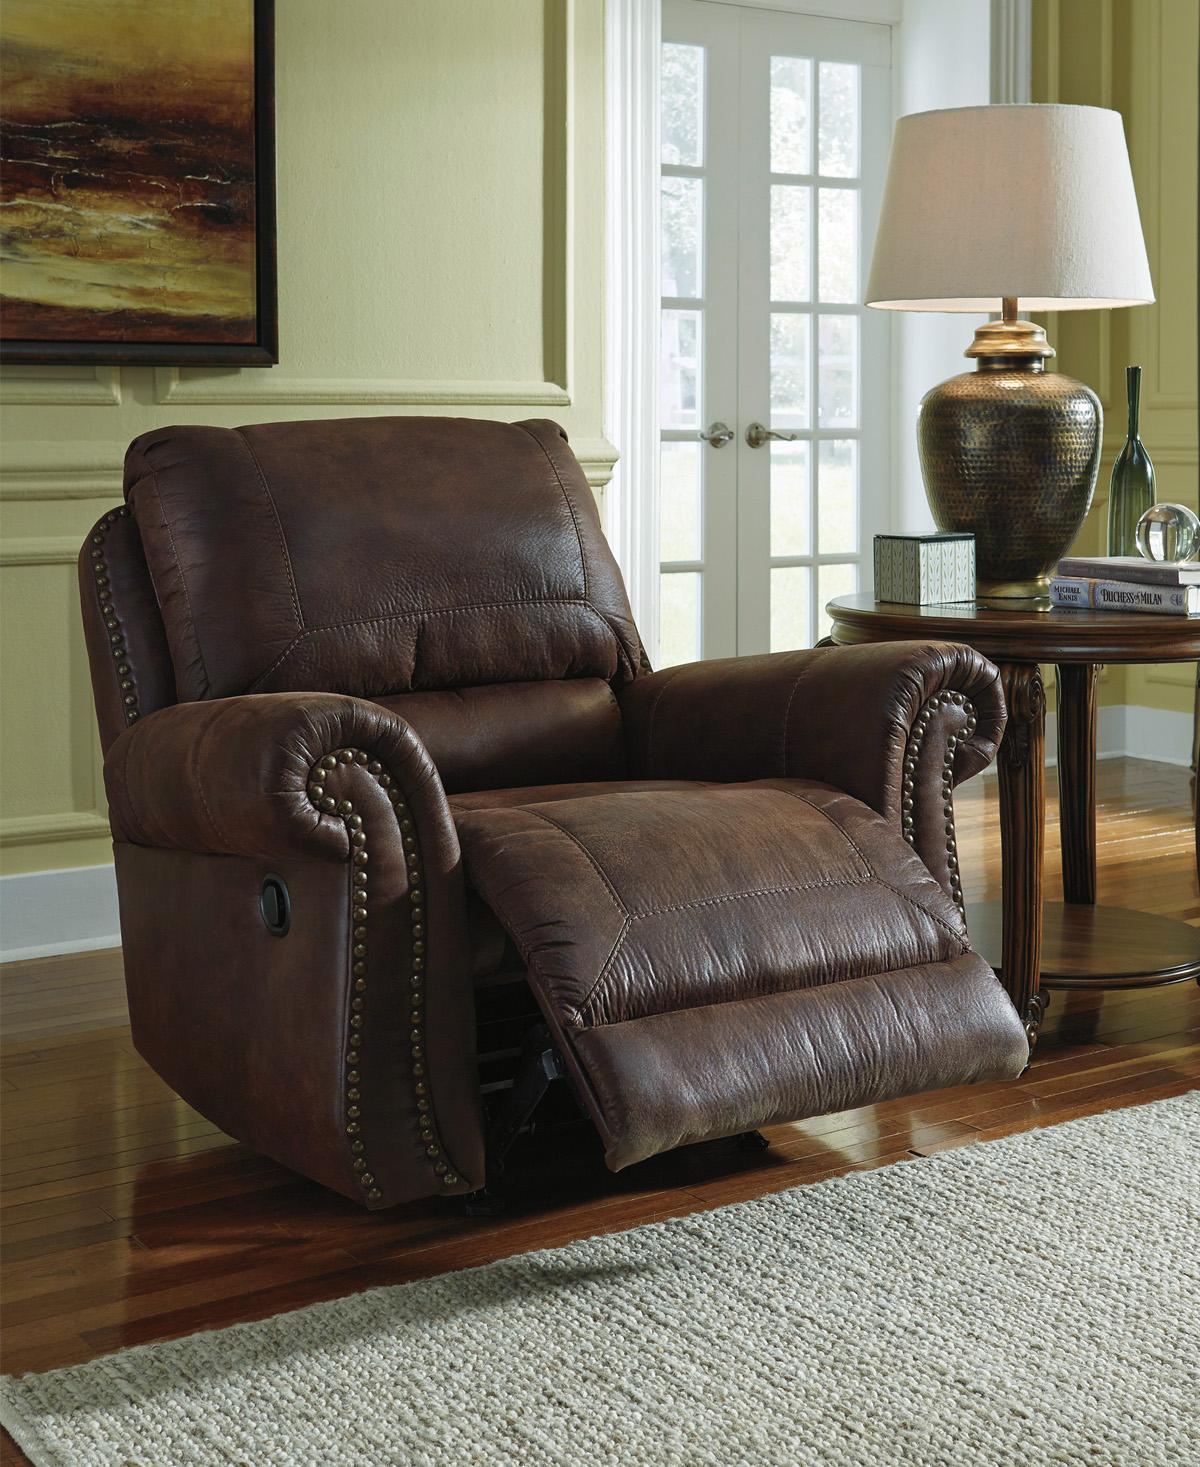 80003-25 reclinable Breville copia